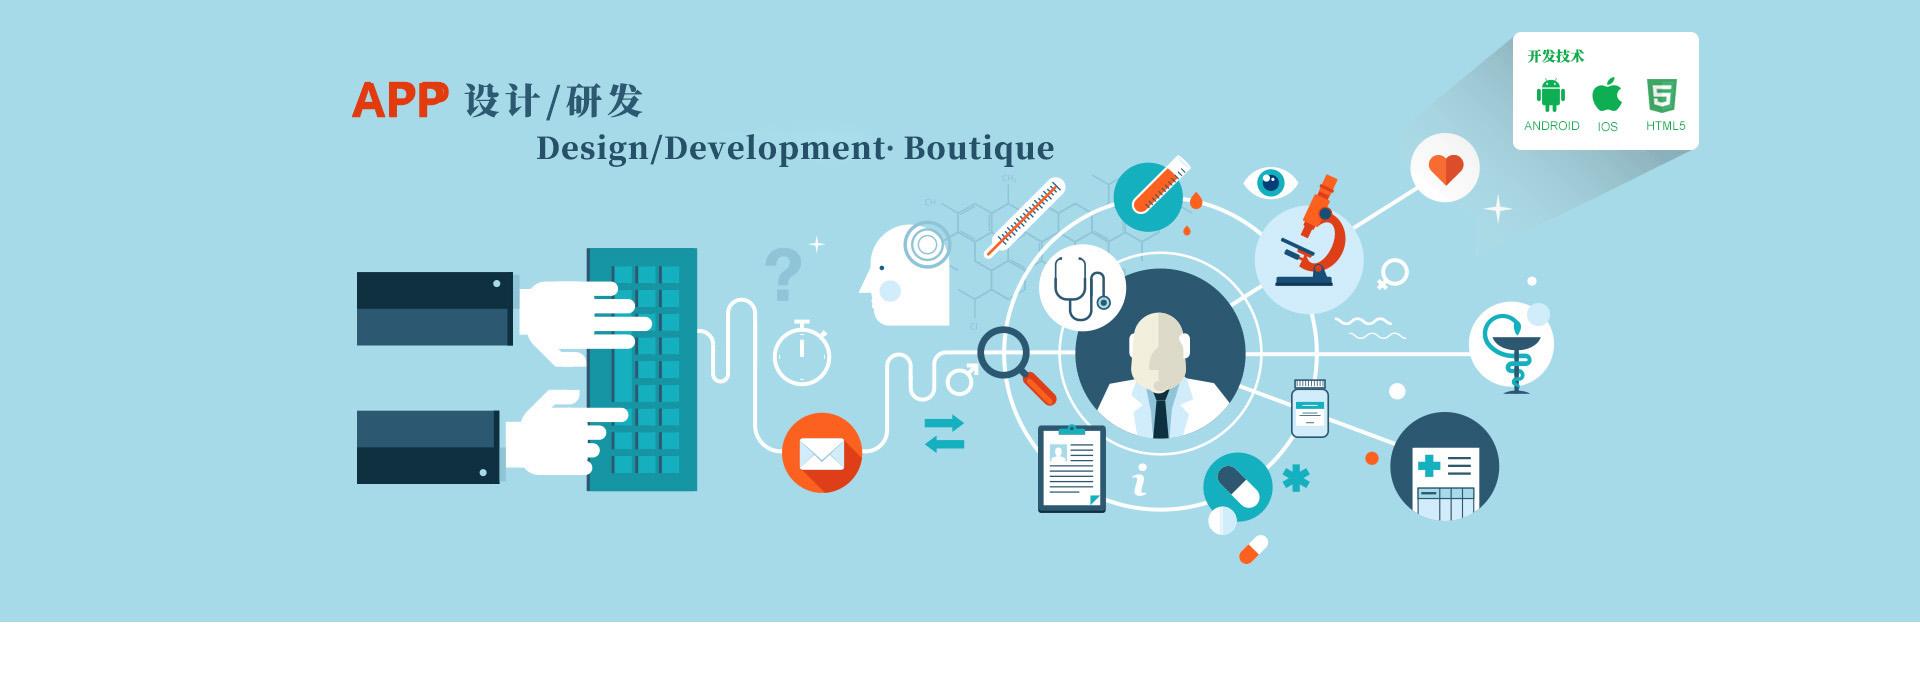 app开发首选盐城浪潮网络,专业的app软件开发公司,致力于行业app开发,手机应用软件开发